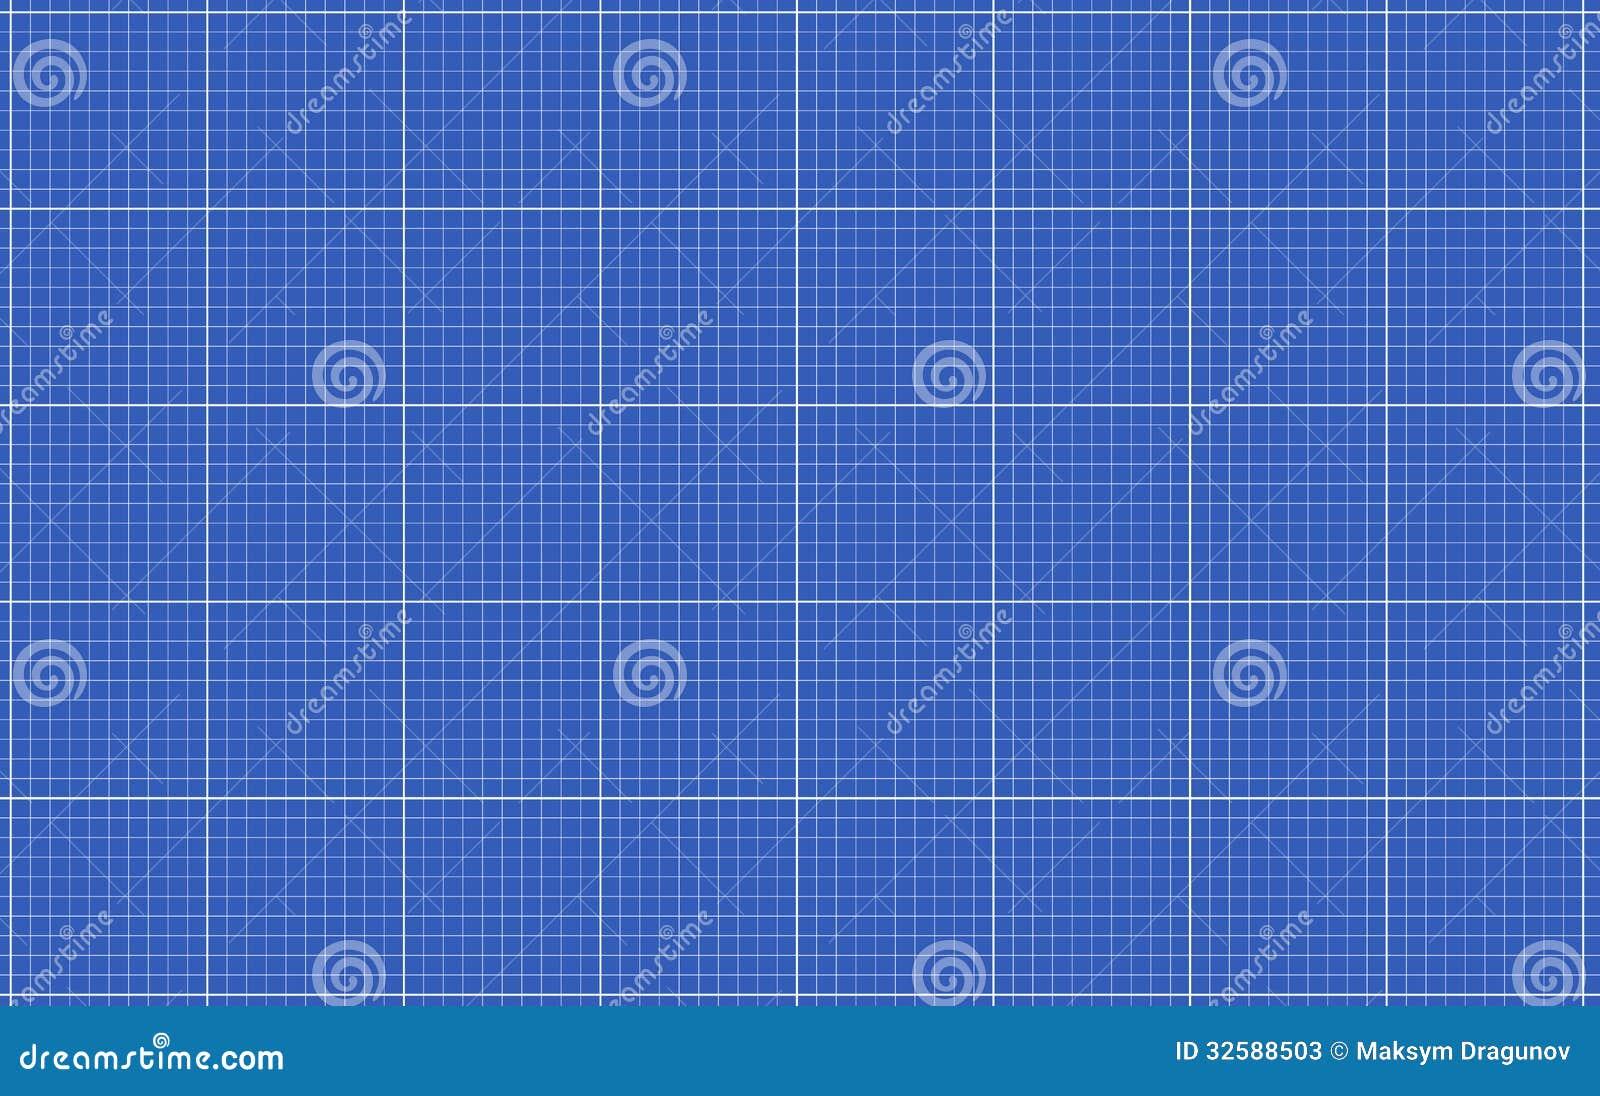 Blueprint Grid Stock Photos - Image: 32588503